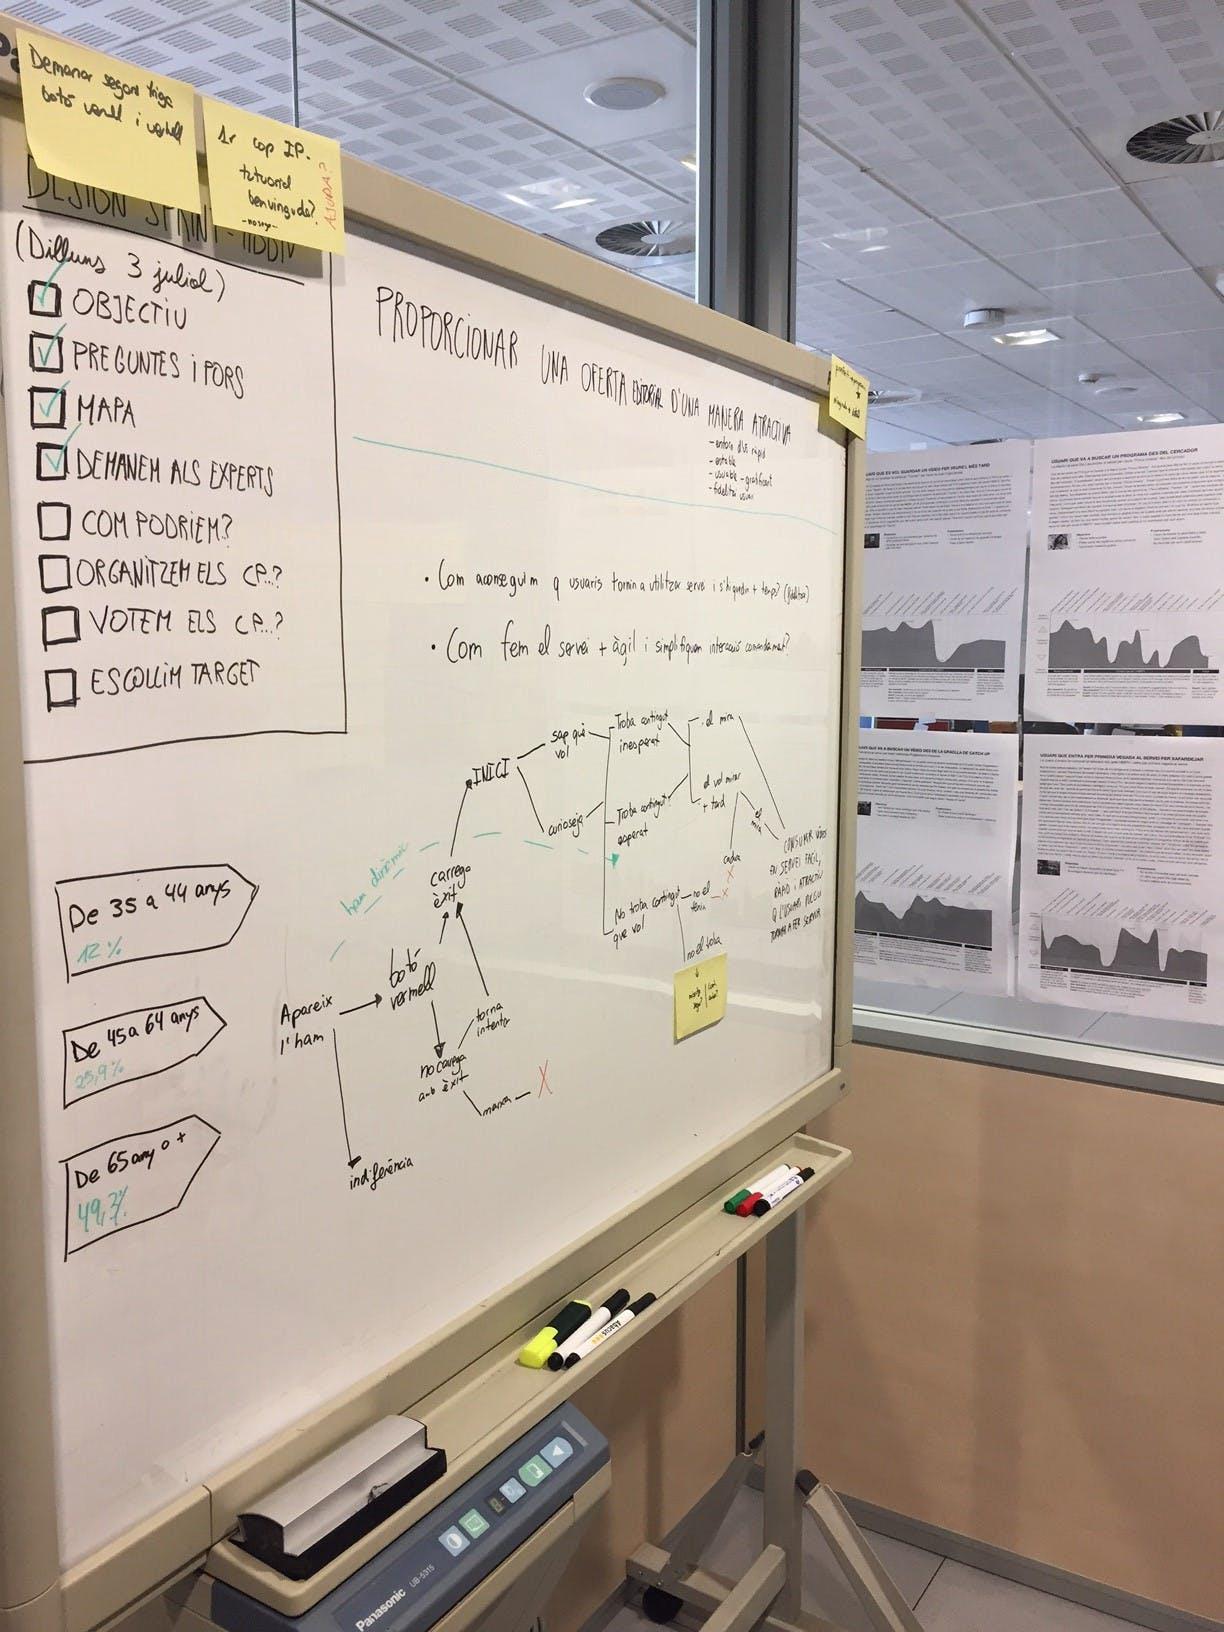 Design sprint hbbtv by metakitirna